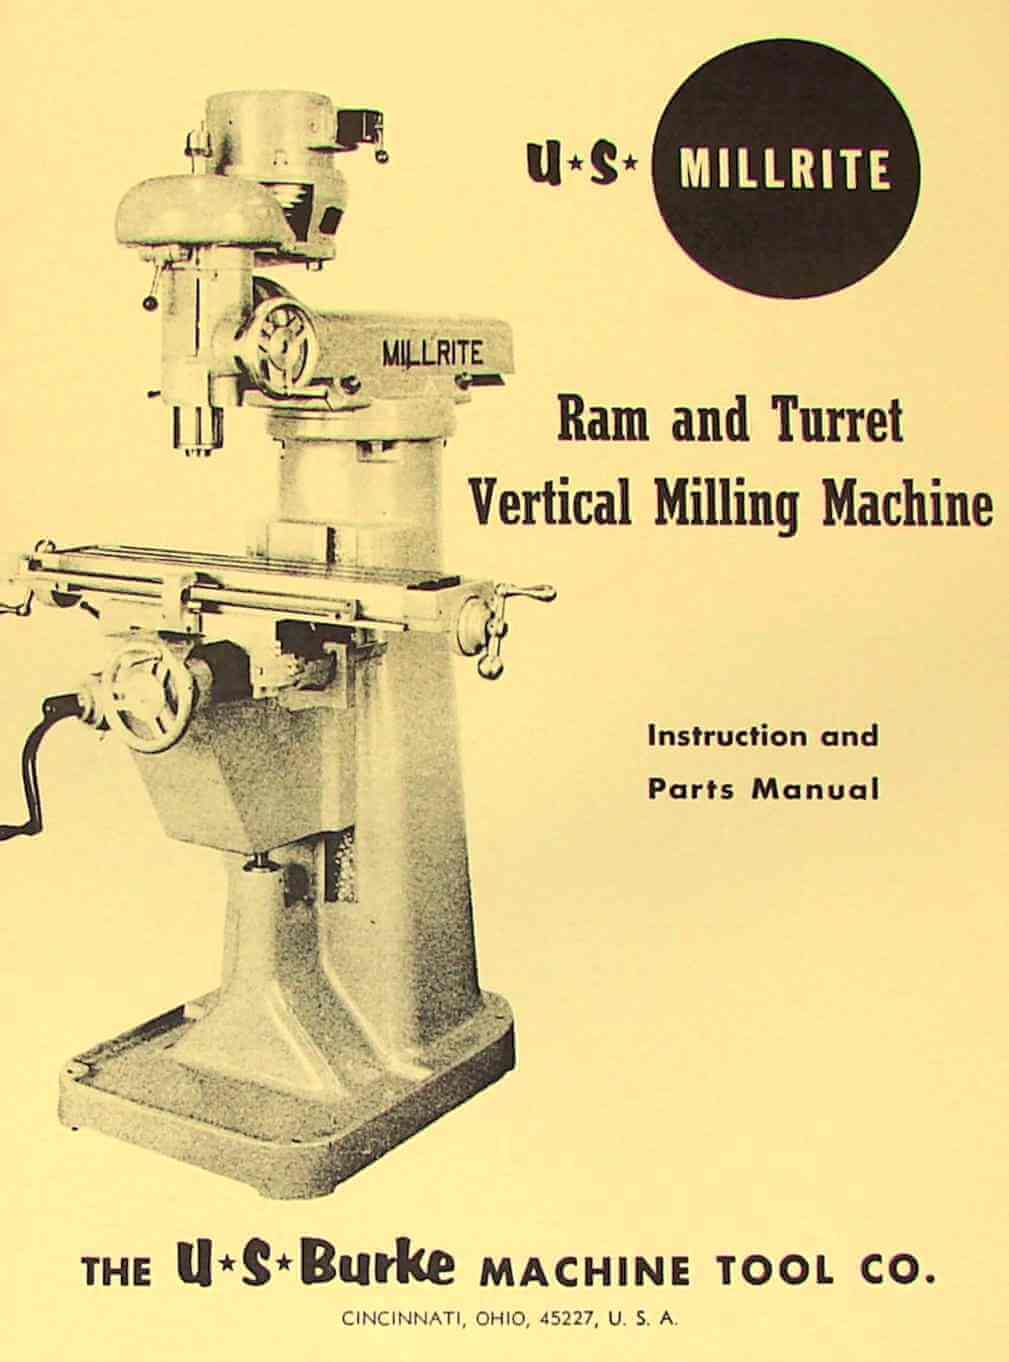 U.S. BURKE Millrite MV-1 Vertical Milling Machine Operator & Parts Manual | Ozark Tool Manuals ...